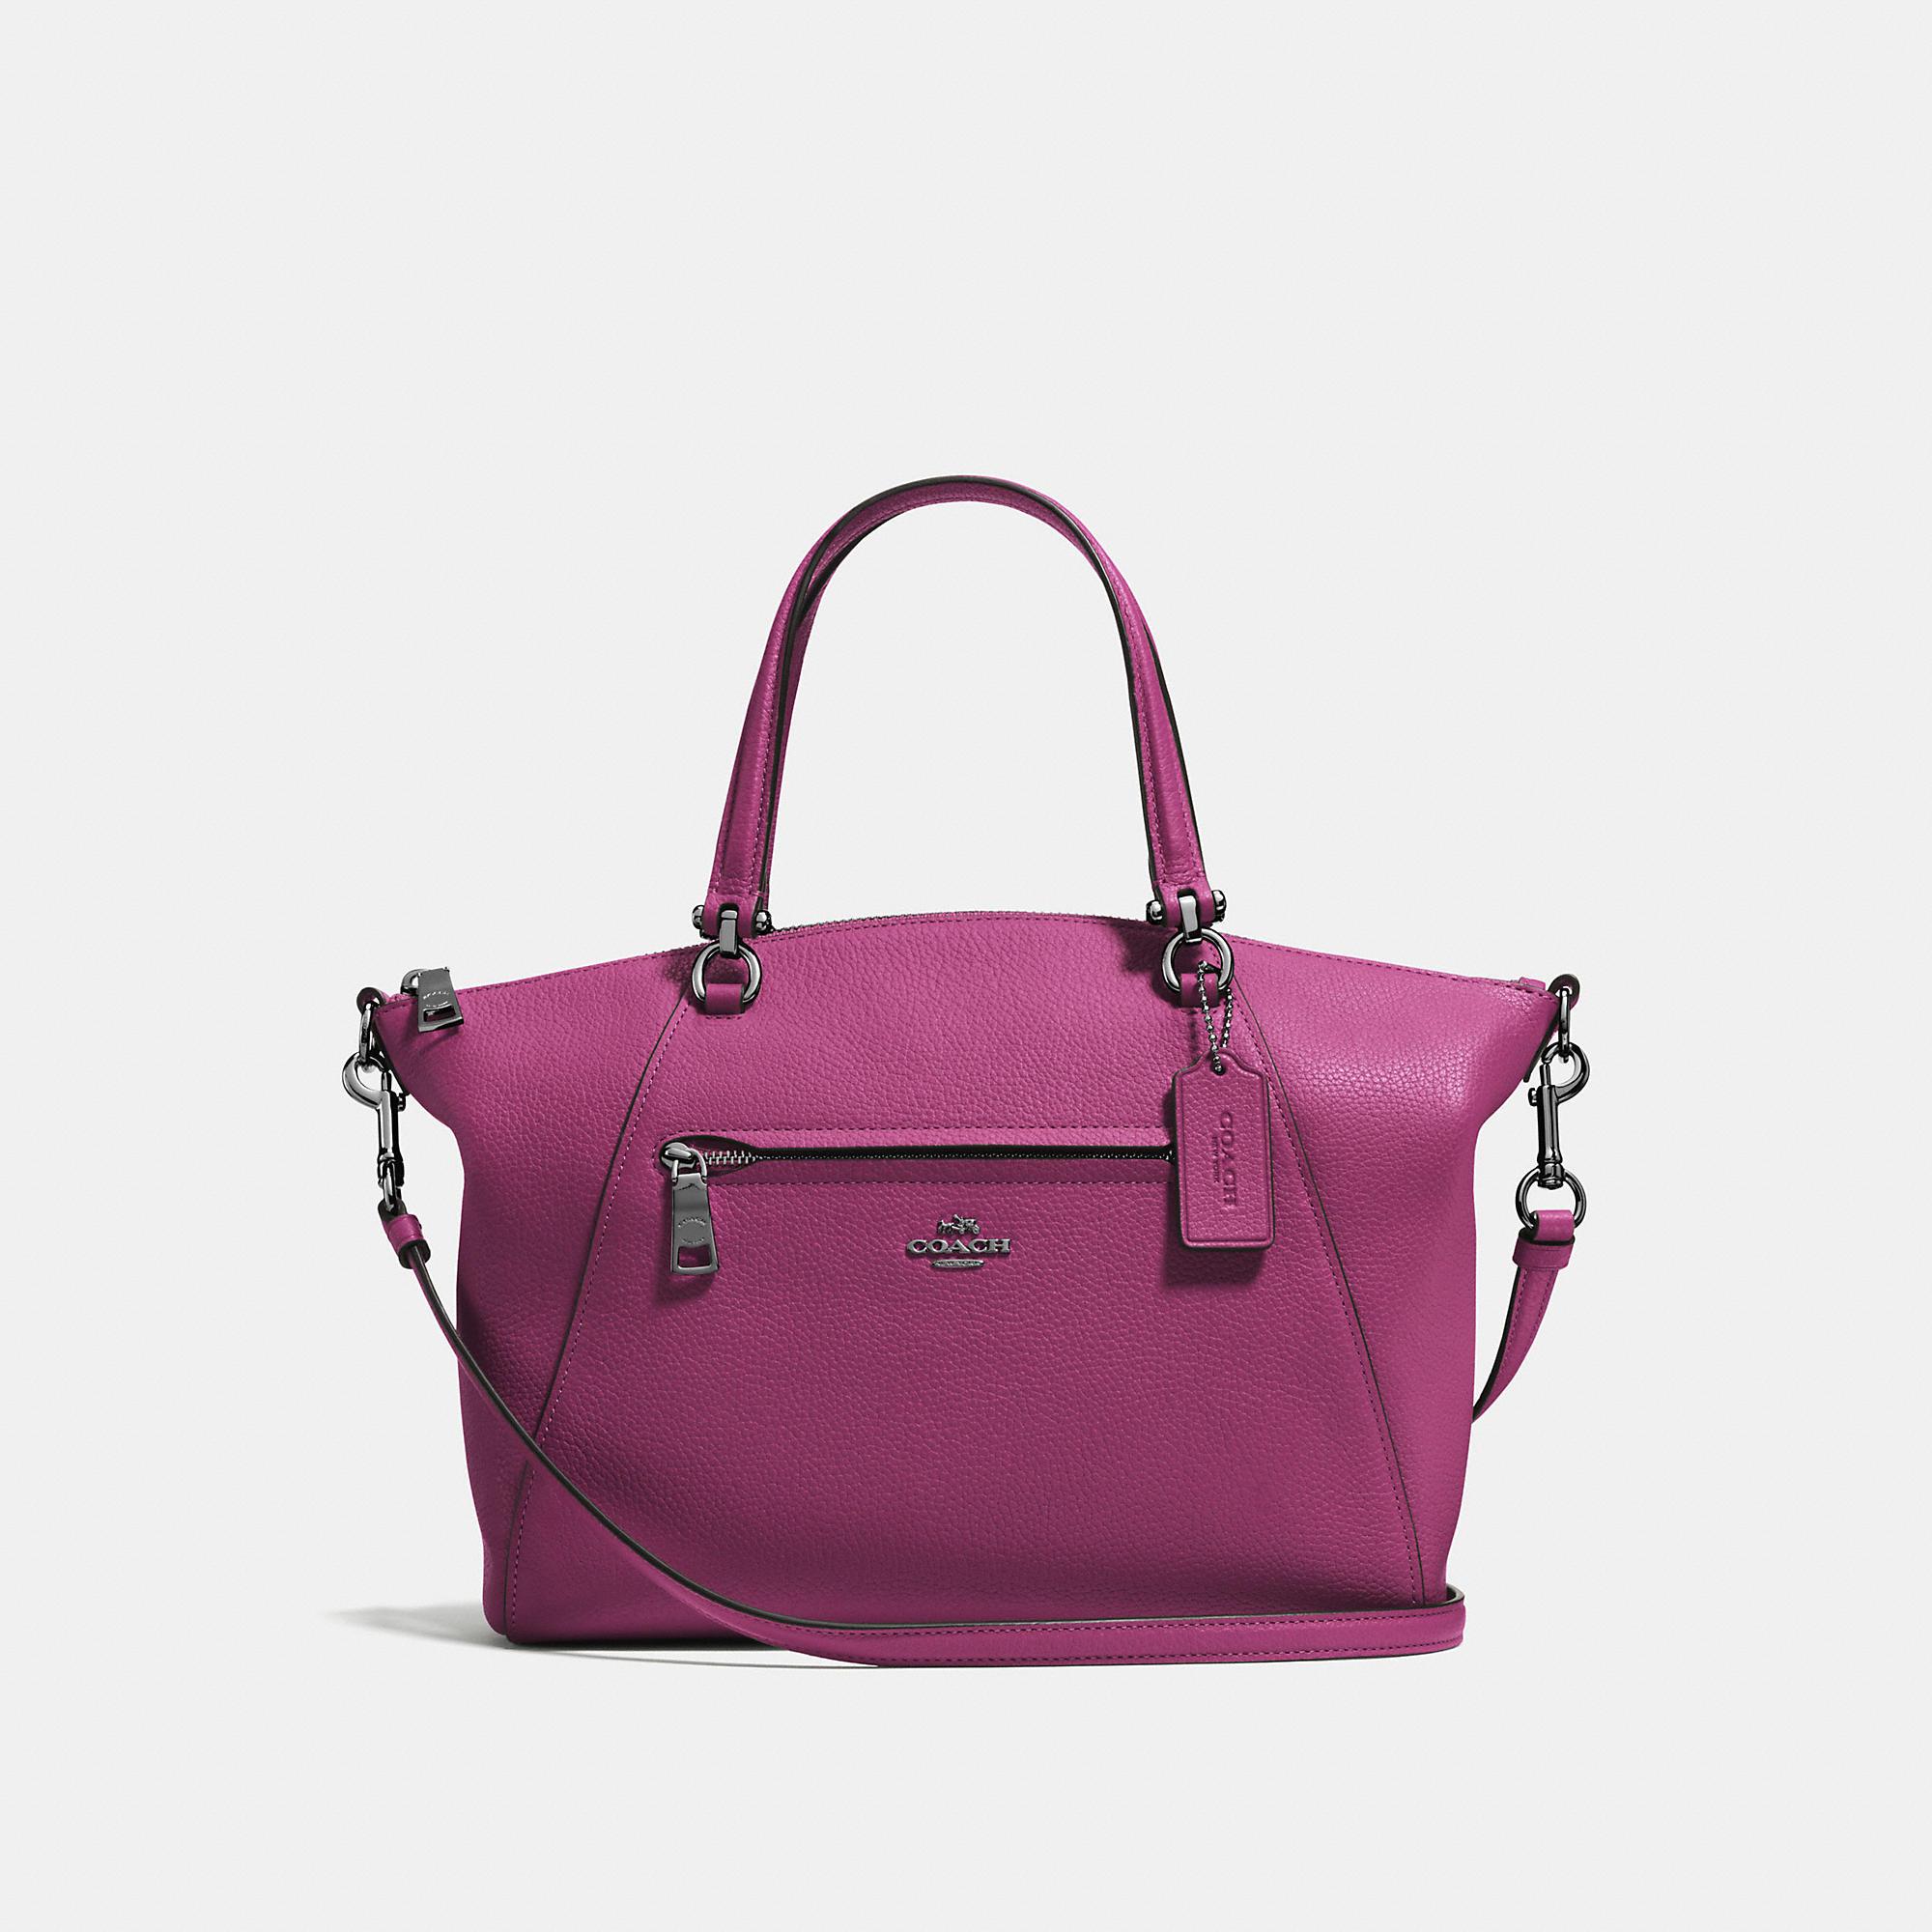 3cb3fd1d6835 COACH Prairie Satchel - Women s Handbags